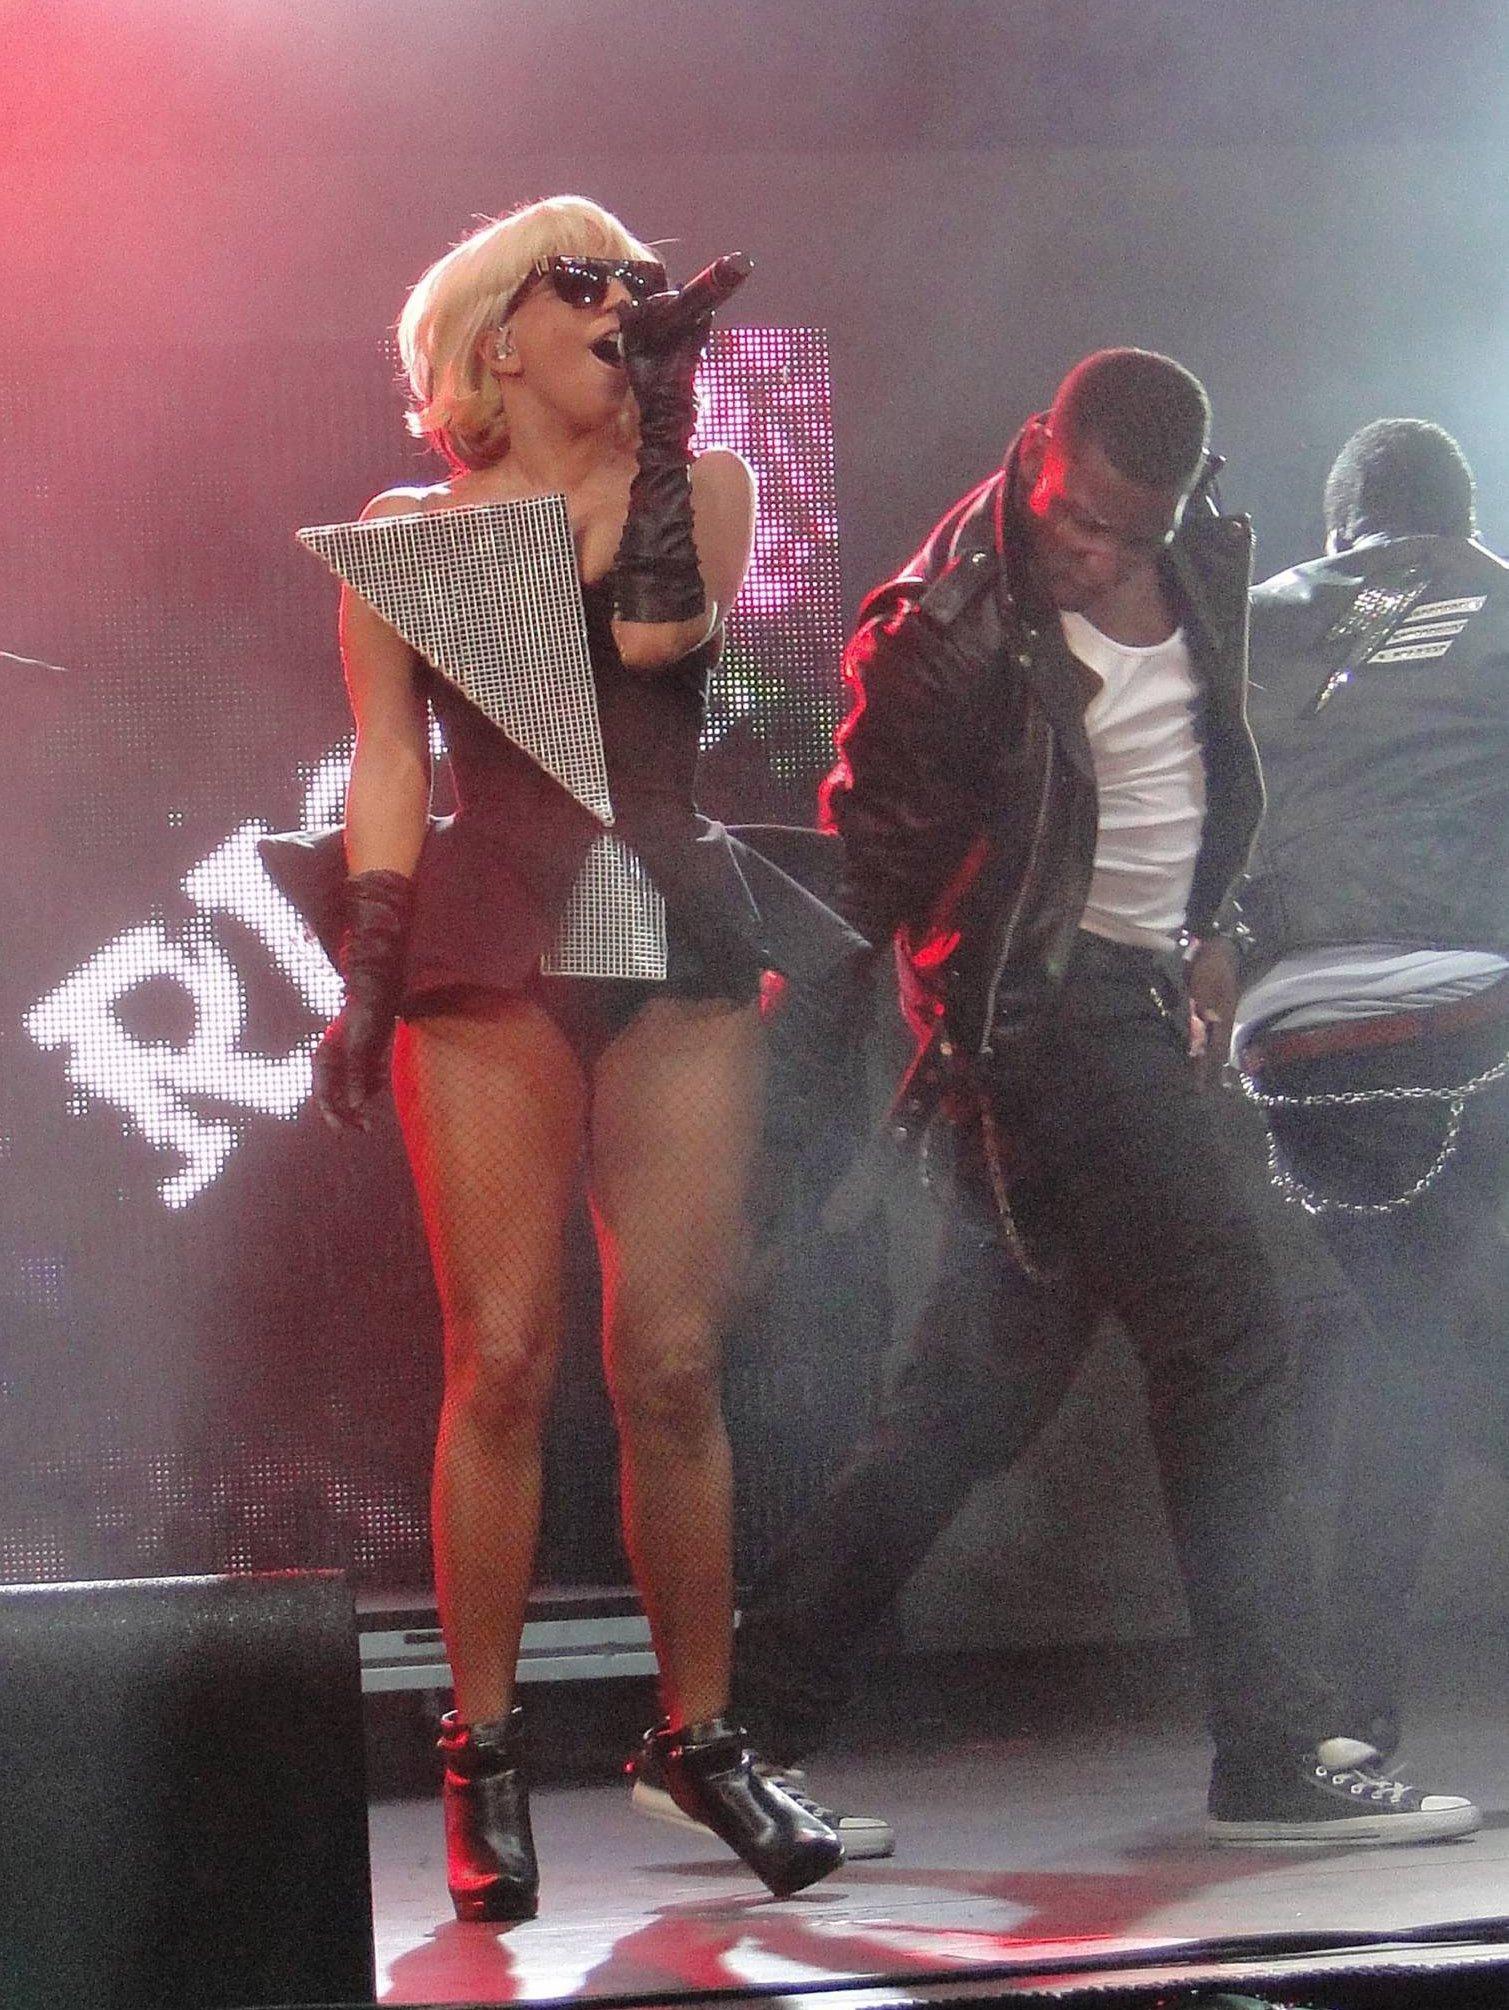 94506_Lady_Gaga_performs_at_KISS_FMs_Wango_Tango-2_122_124lo.jpg